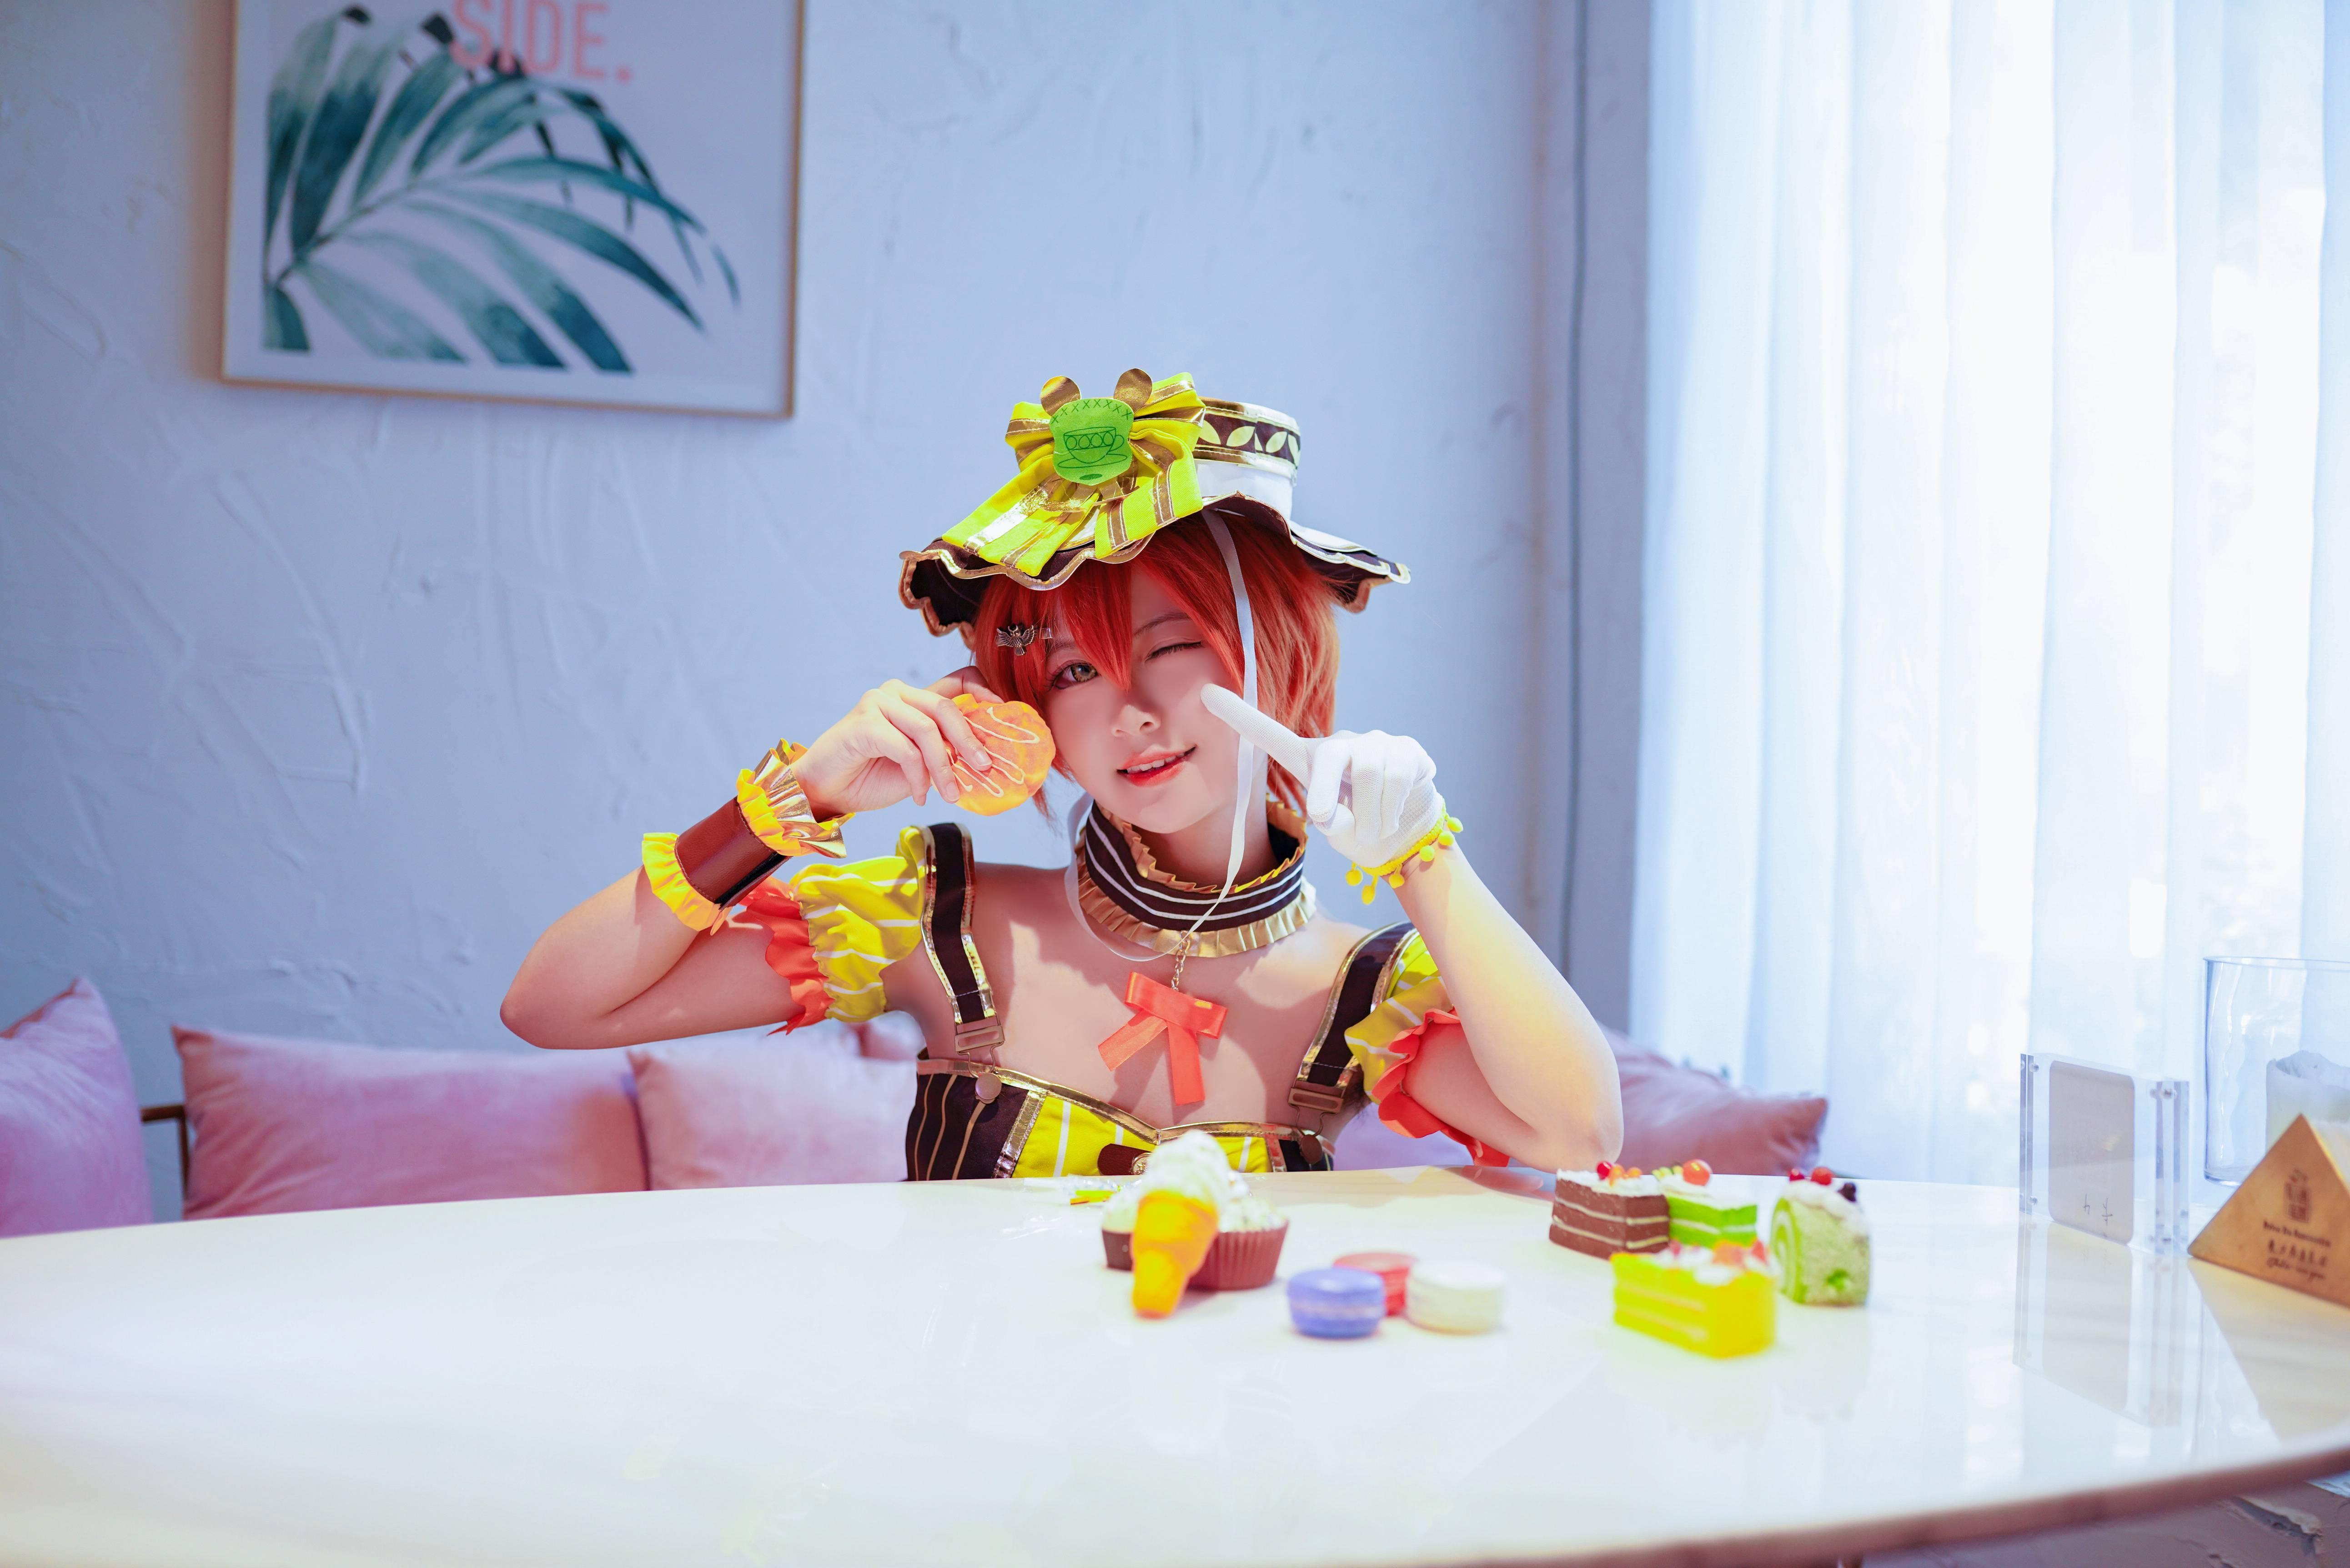 《LOVE LIVE!》少女cosplay【CN:_李笑颜Lee】-第3张